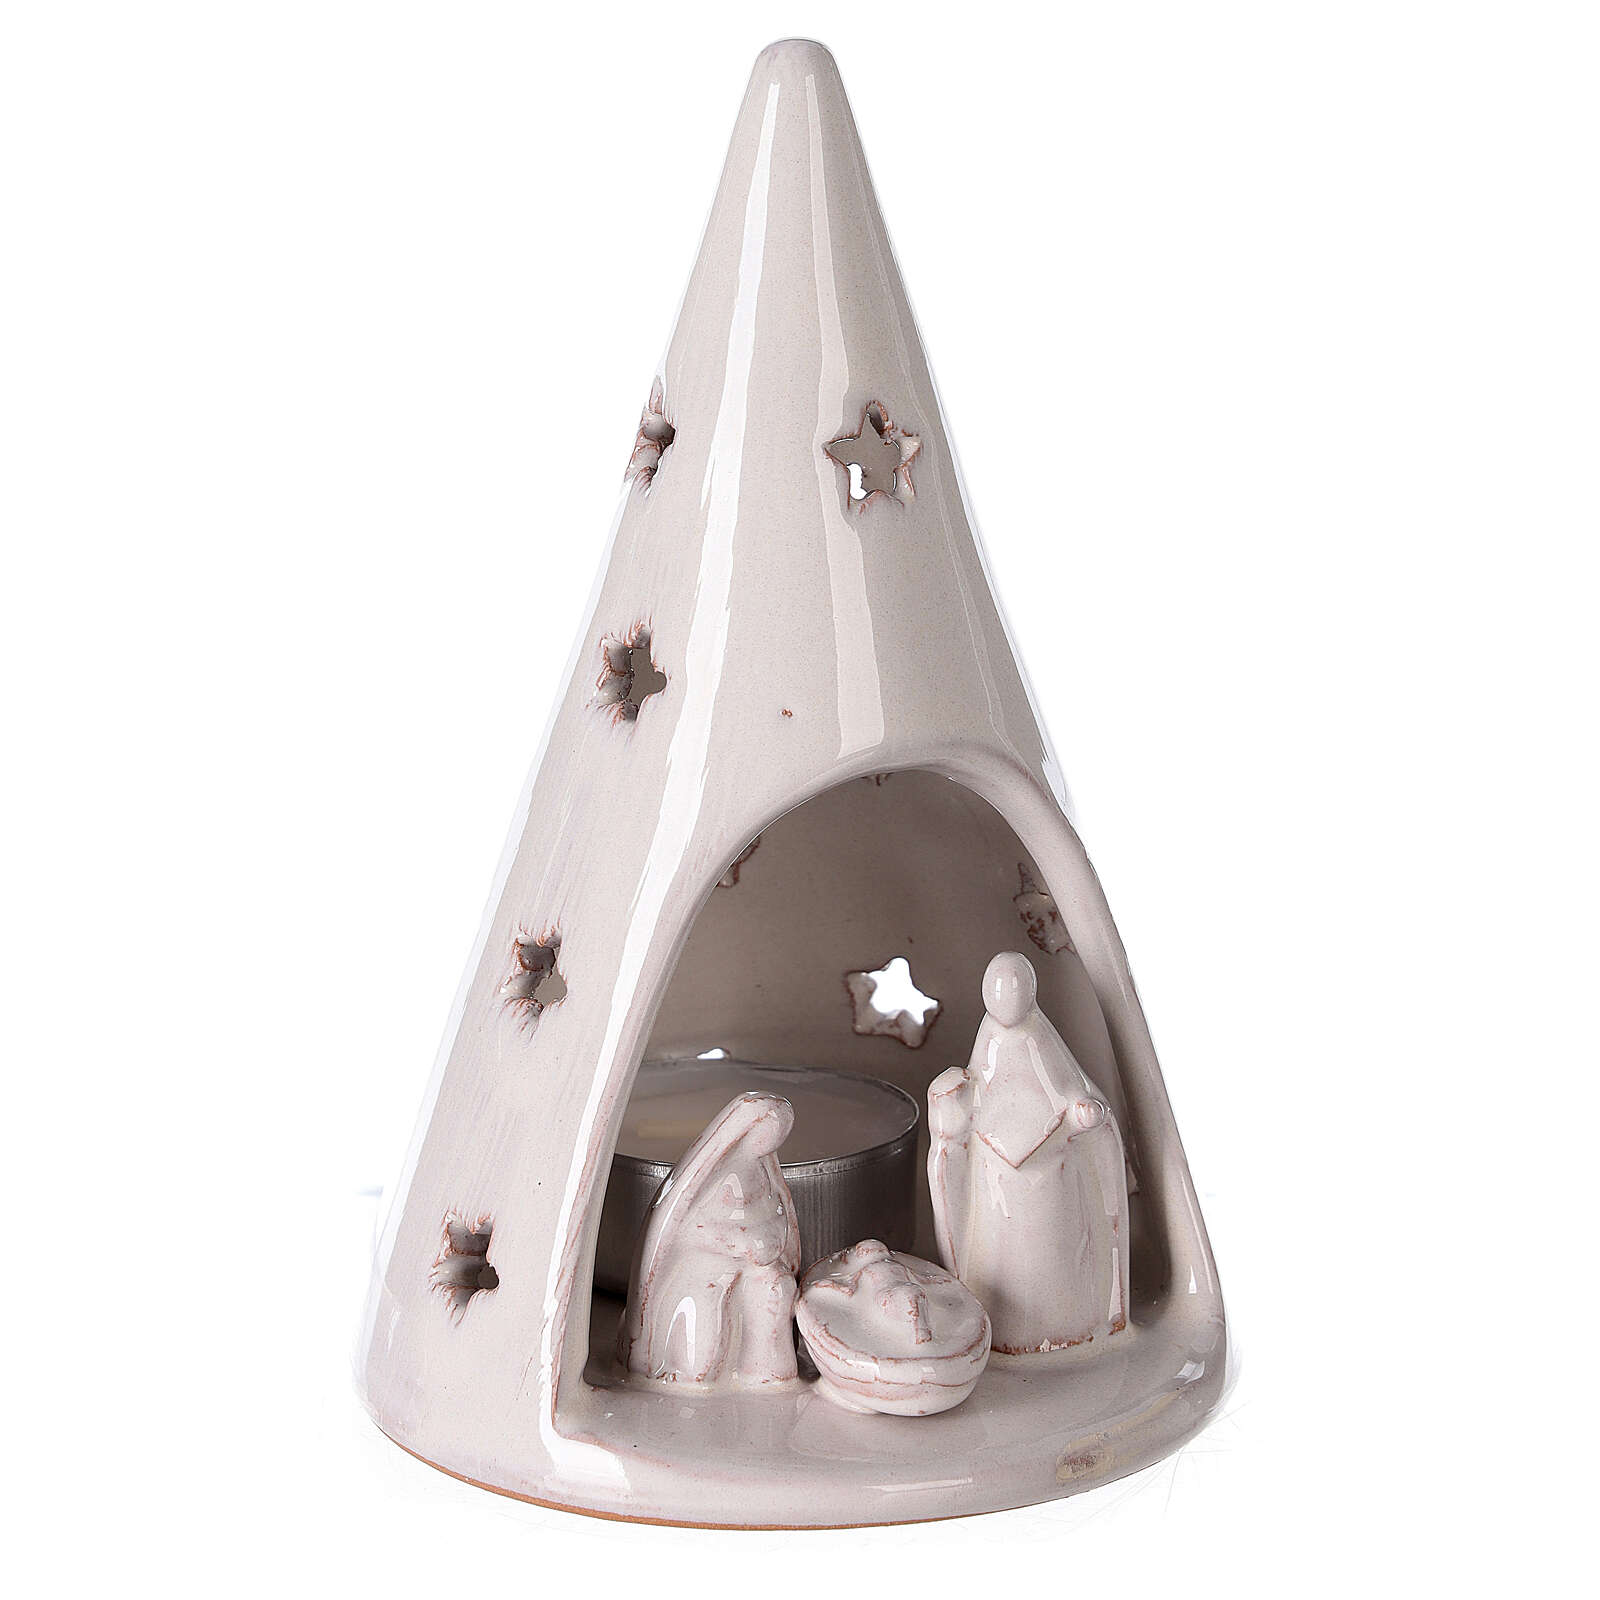 Cone tree with tealight in white Deruta terracotta 15 cm 4